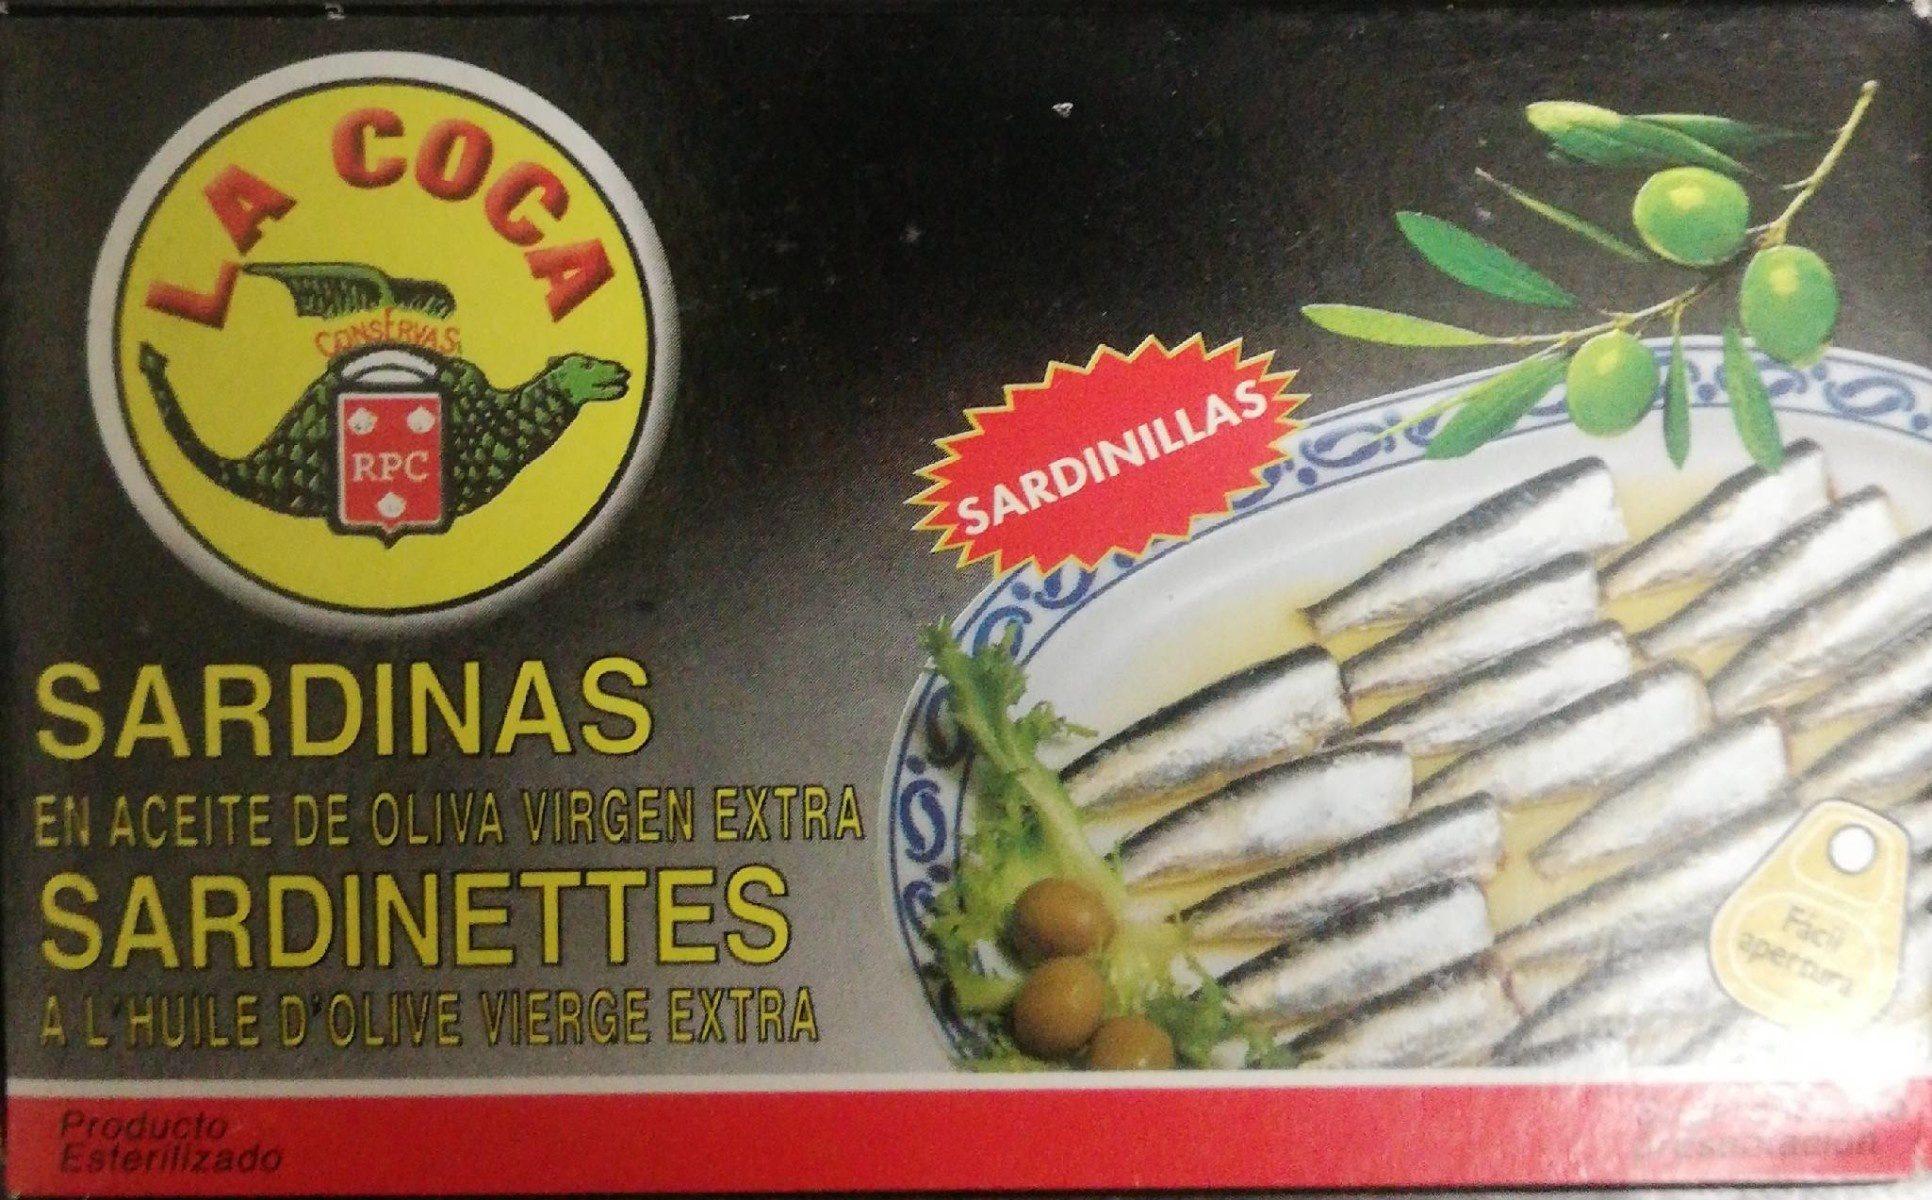 Sardinas en aceite de oliva virgen extra - Product